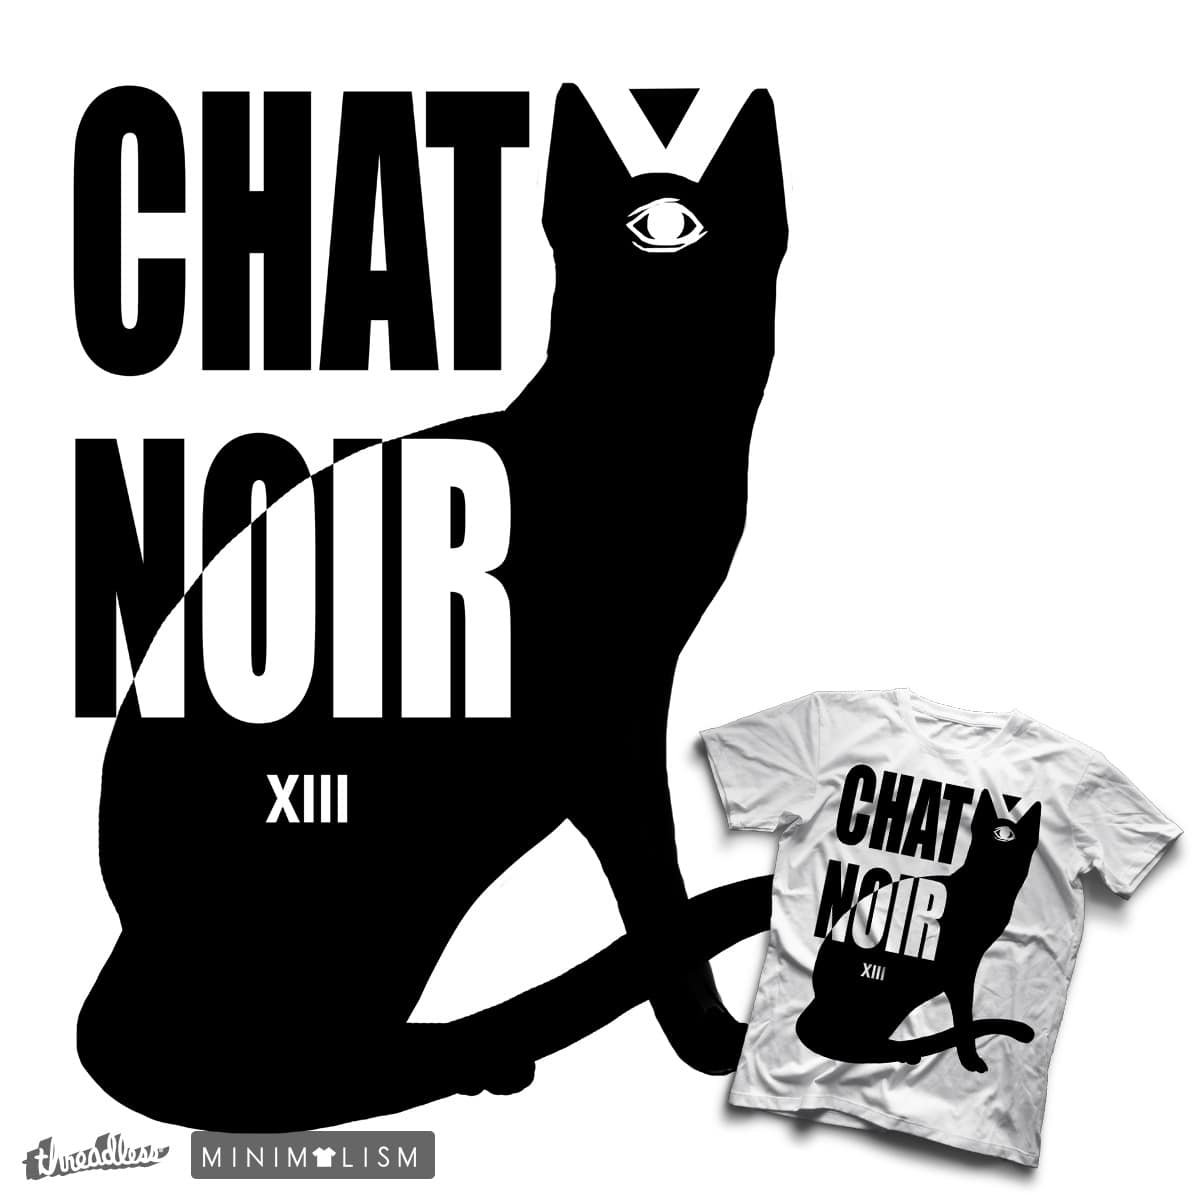 Chat Noir by Bburkhart on Threadless